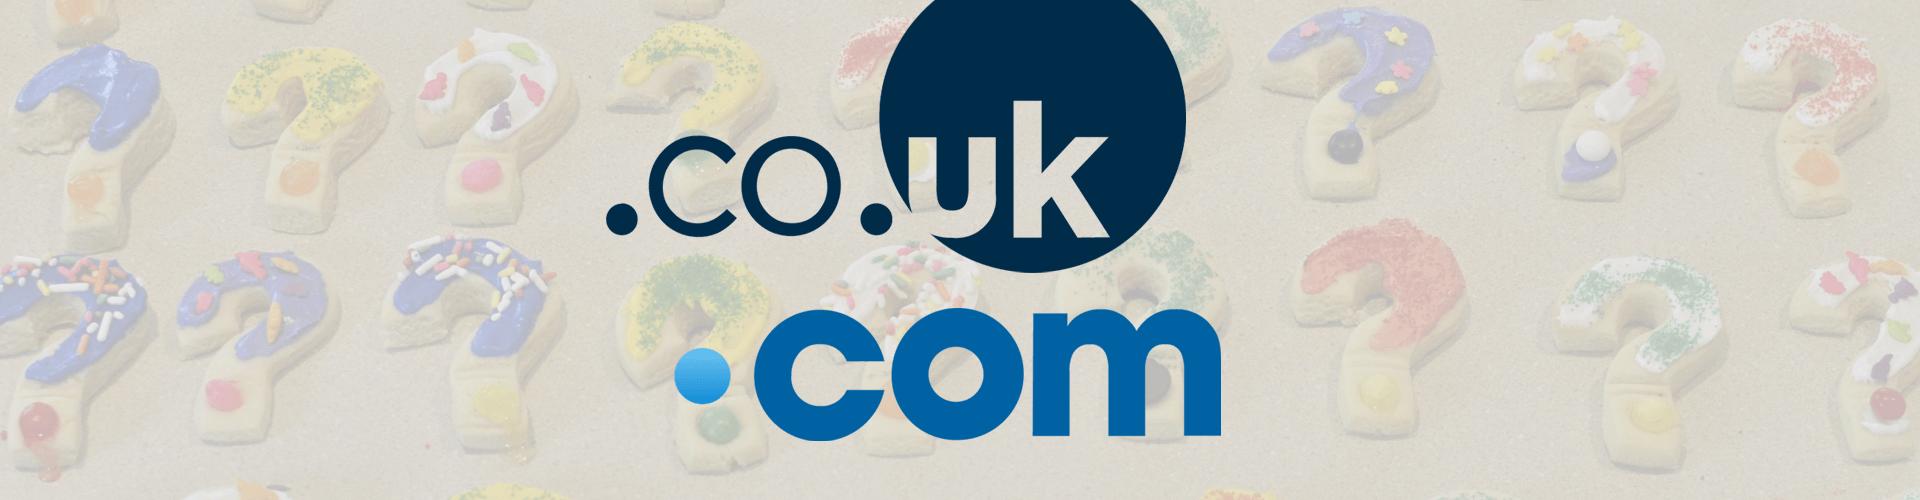 .co.uk or .com?